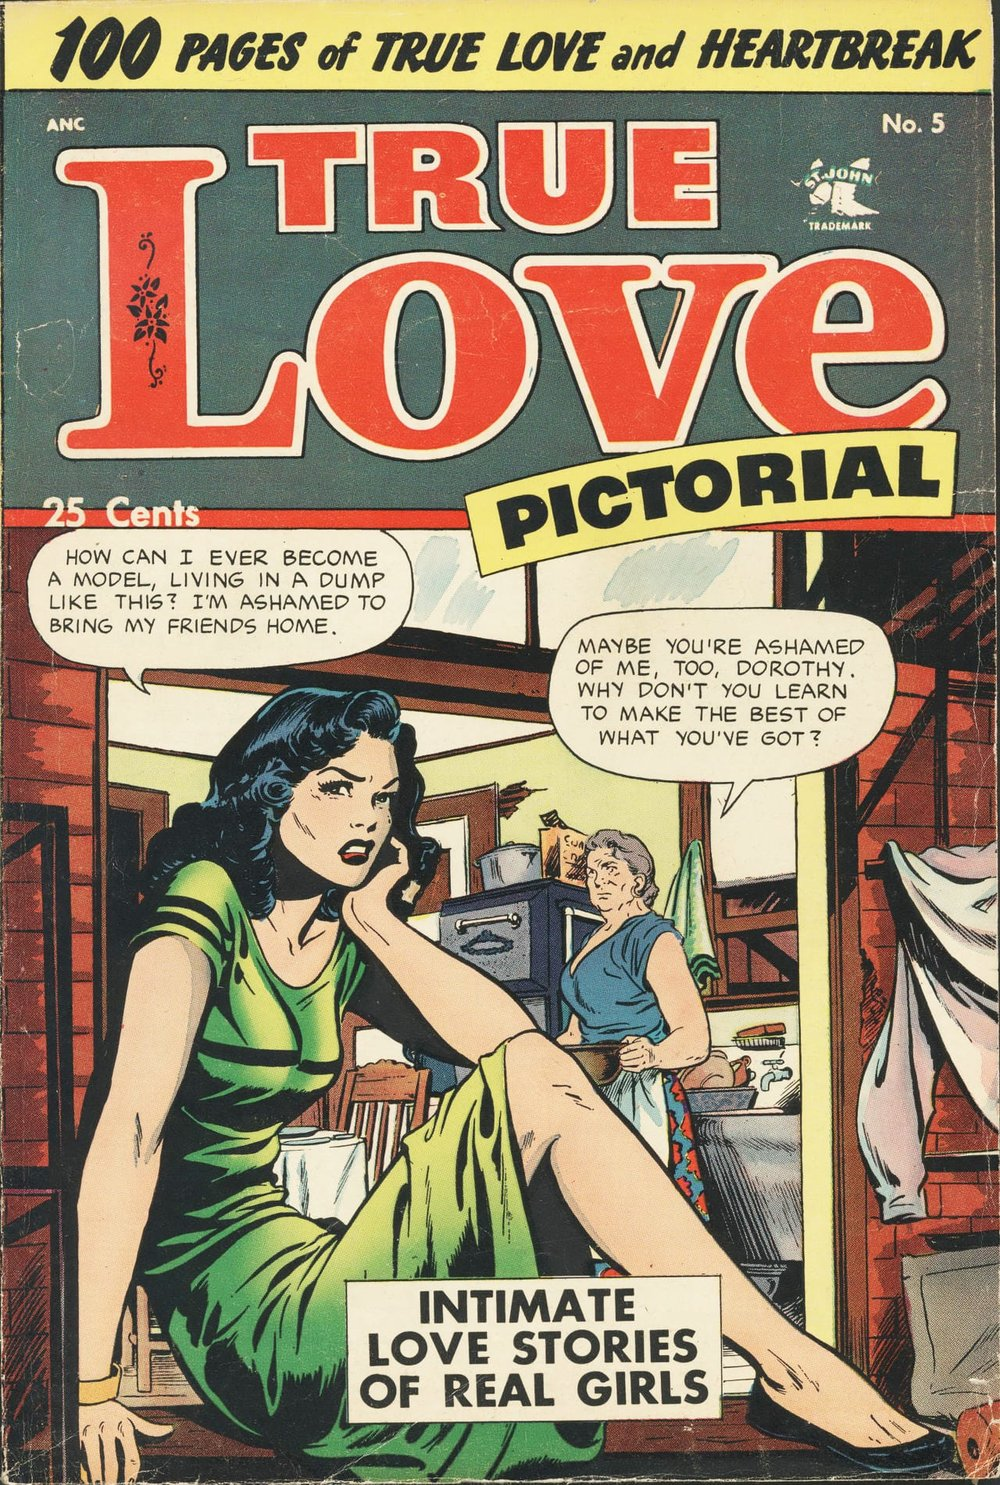 Public domain comic from Digital Comic Museum